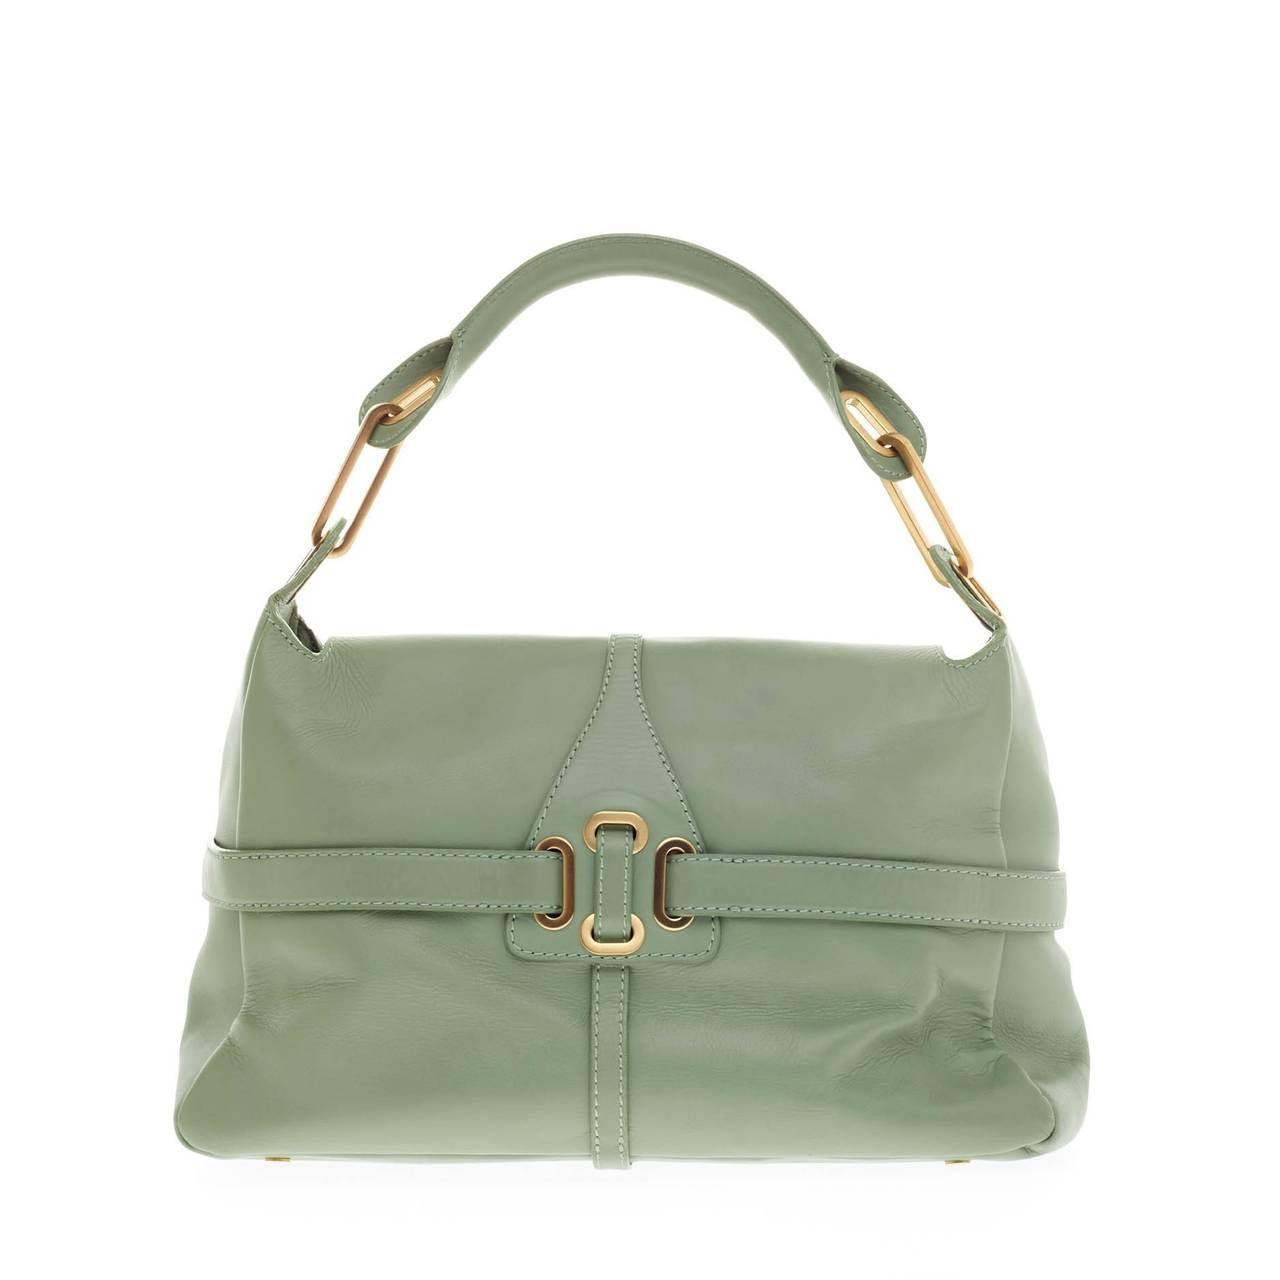 Women's Jimmy Choo Tulita Shoulder Bag Leather For Sale